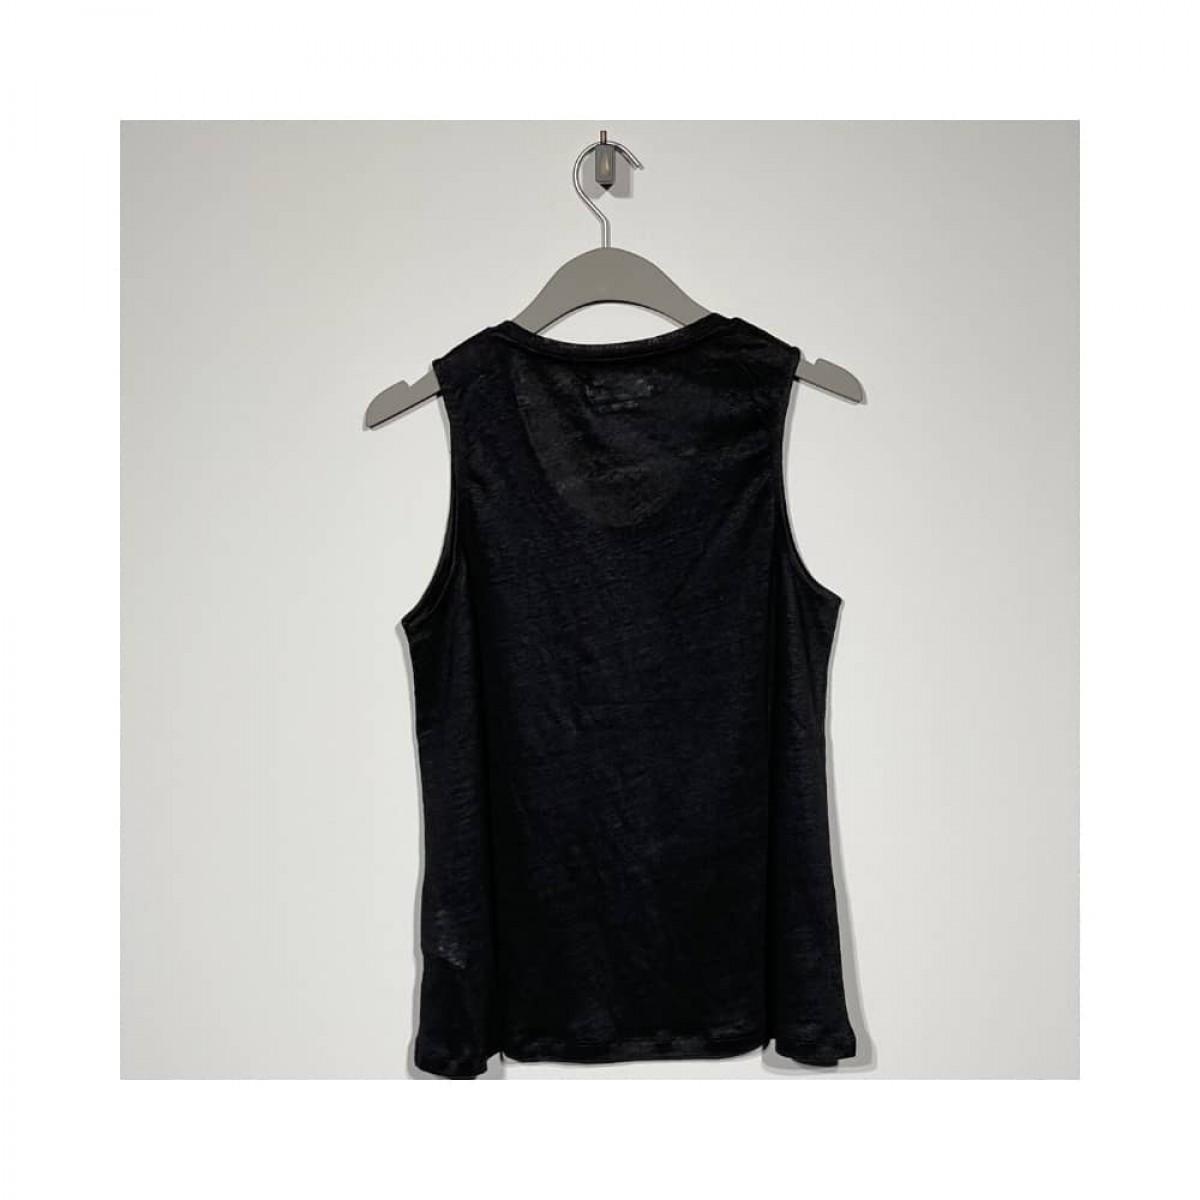 yana top - noir - bag